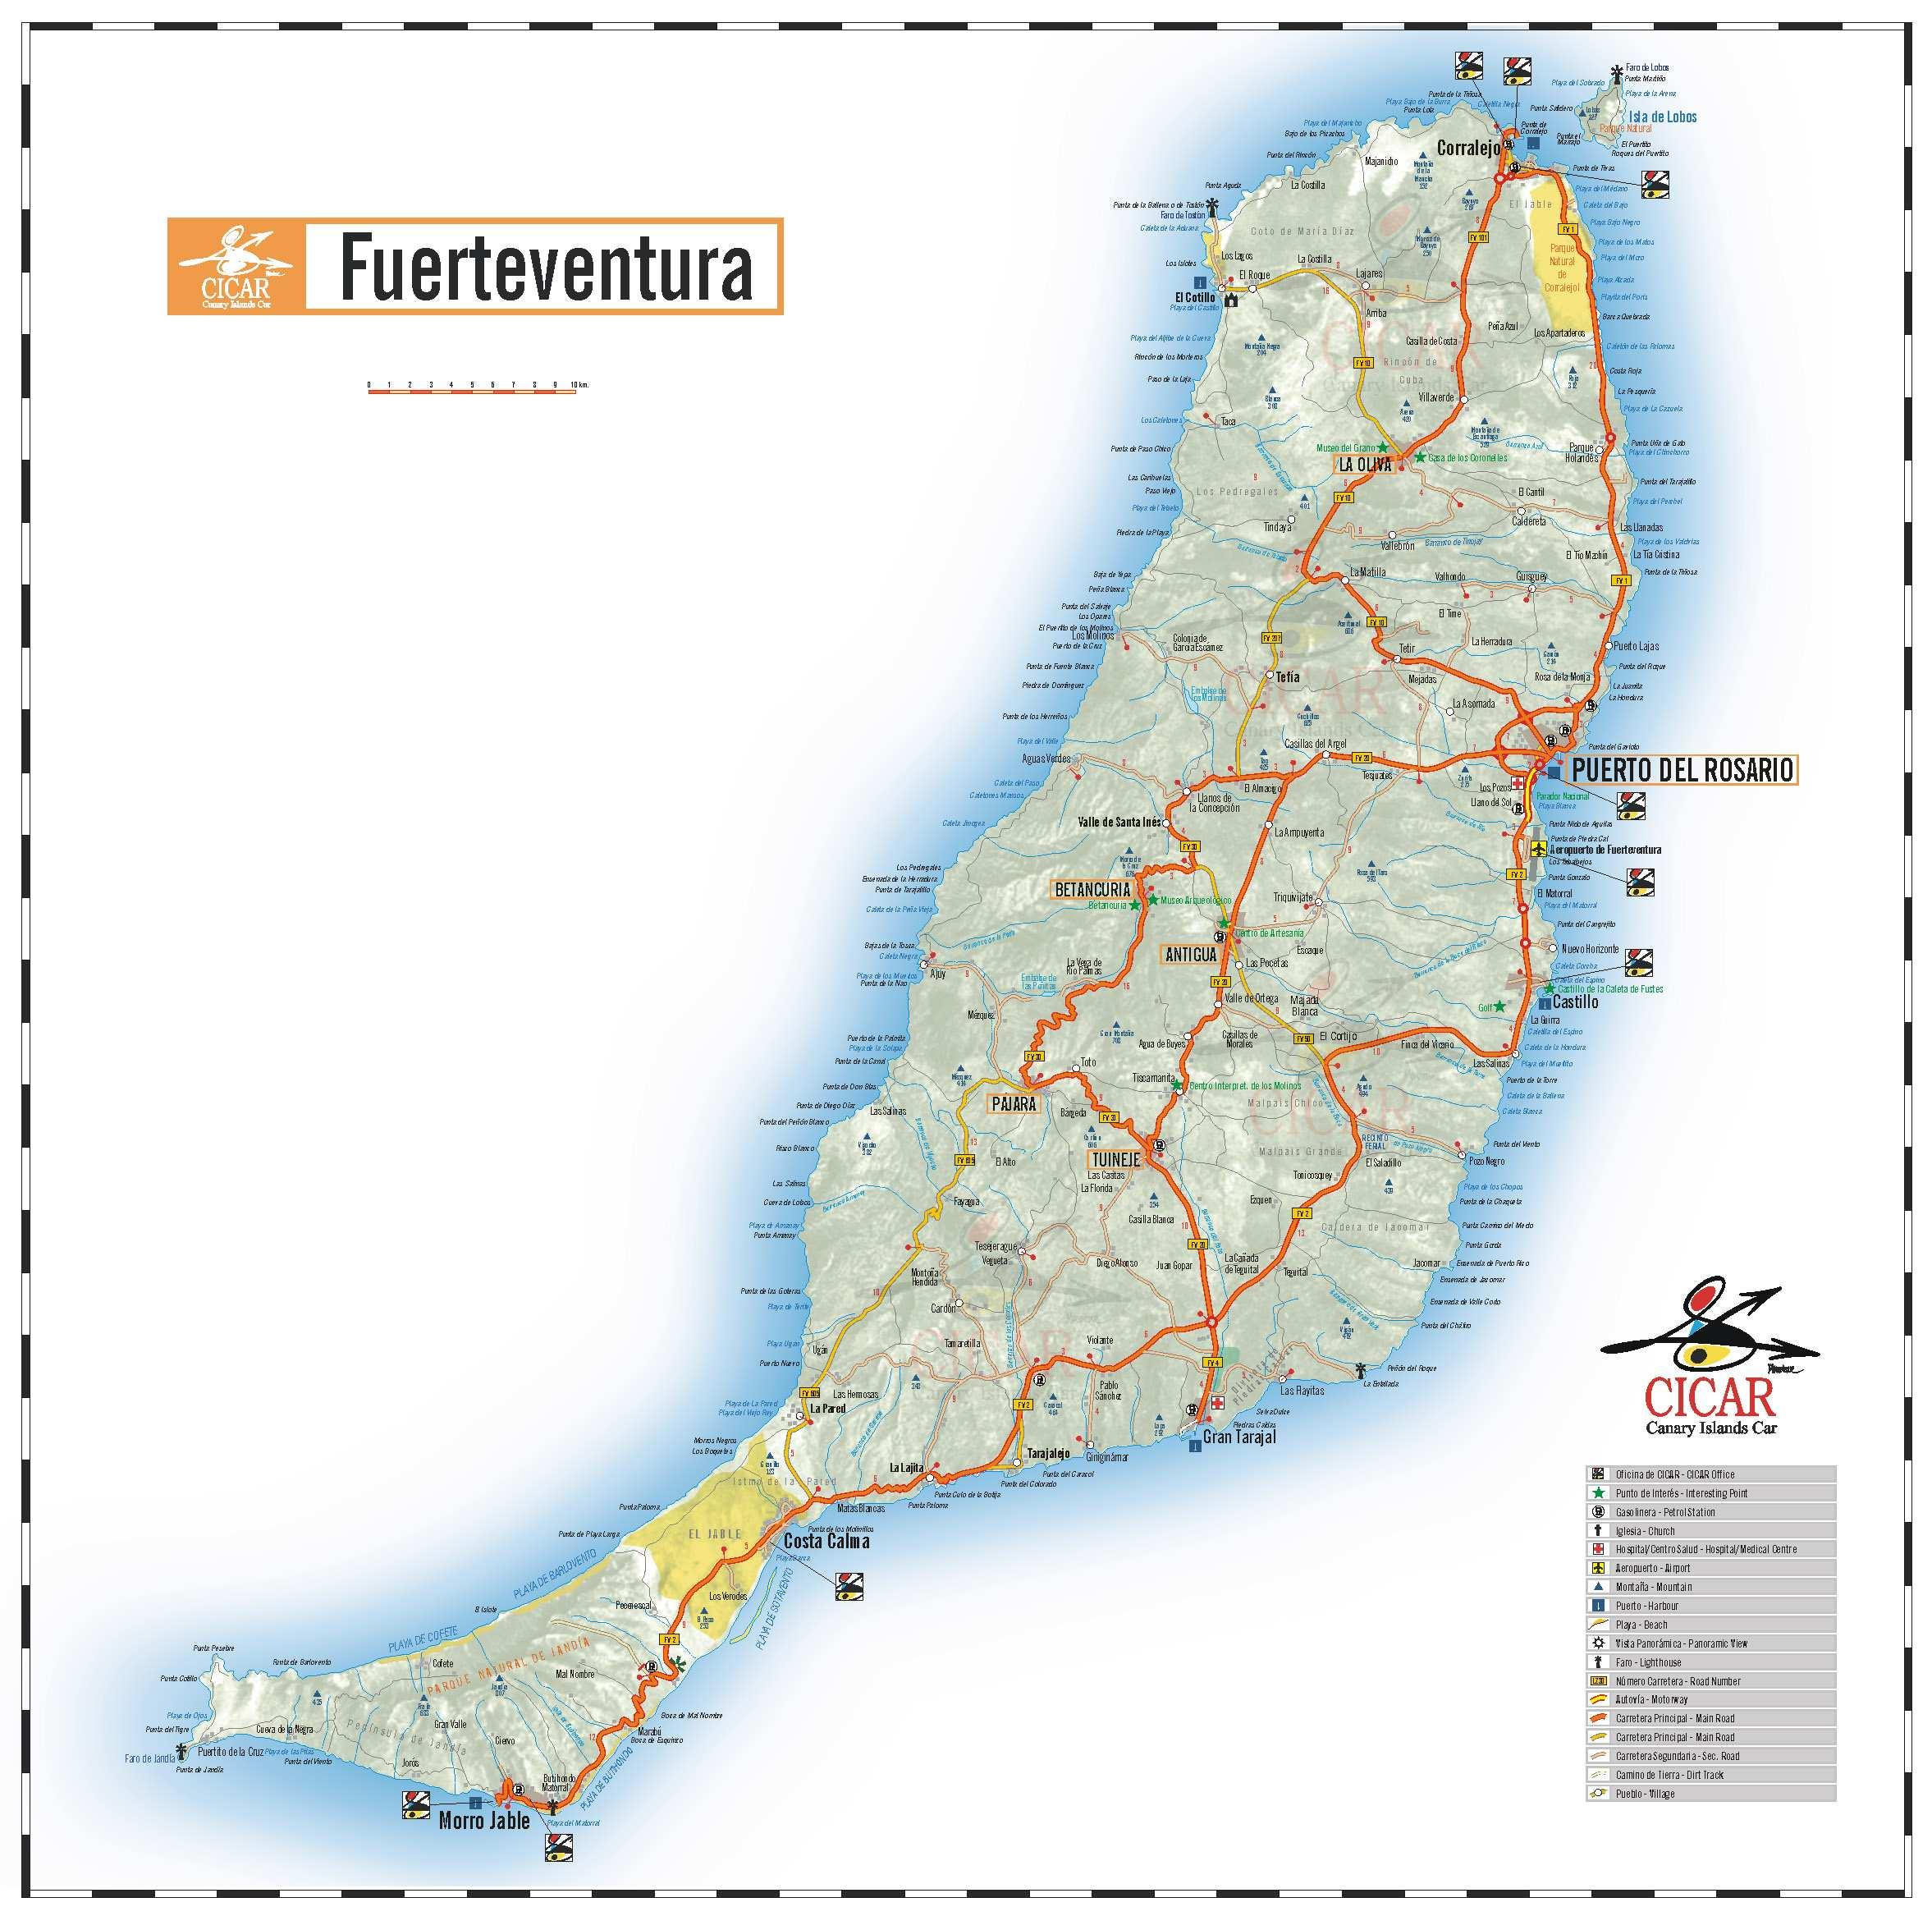 Карта острова Фуэнтевентура